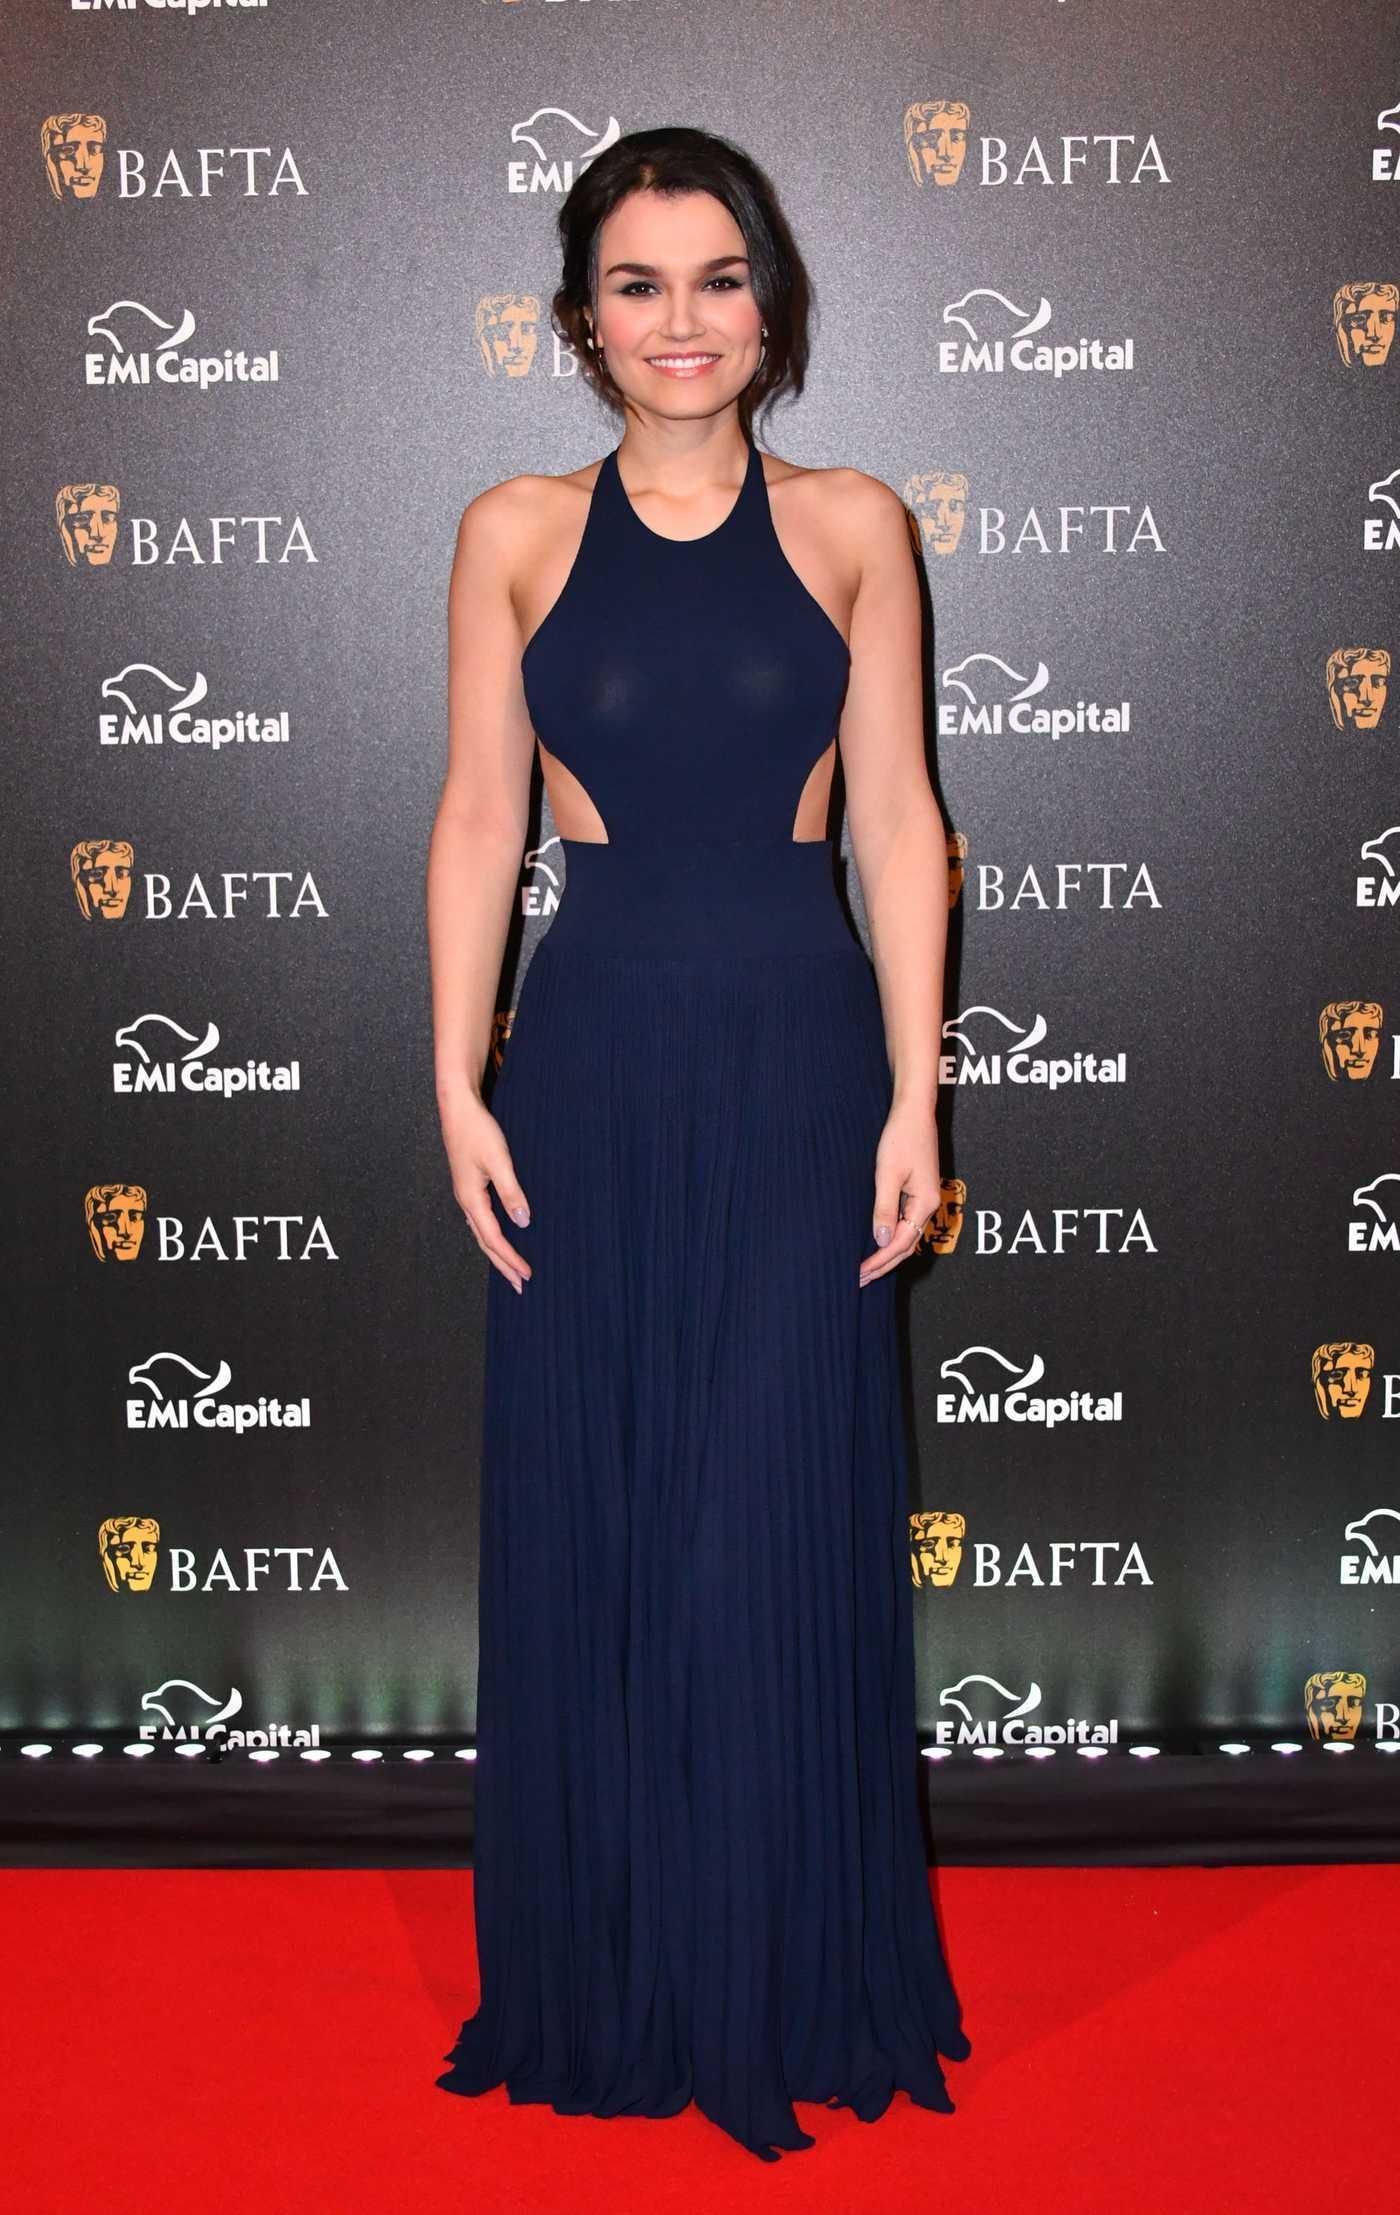 Samantha Barks at the Harvey Weinstein Pre BAFTA Dinner in London 02/10/2017